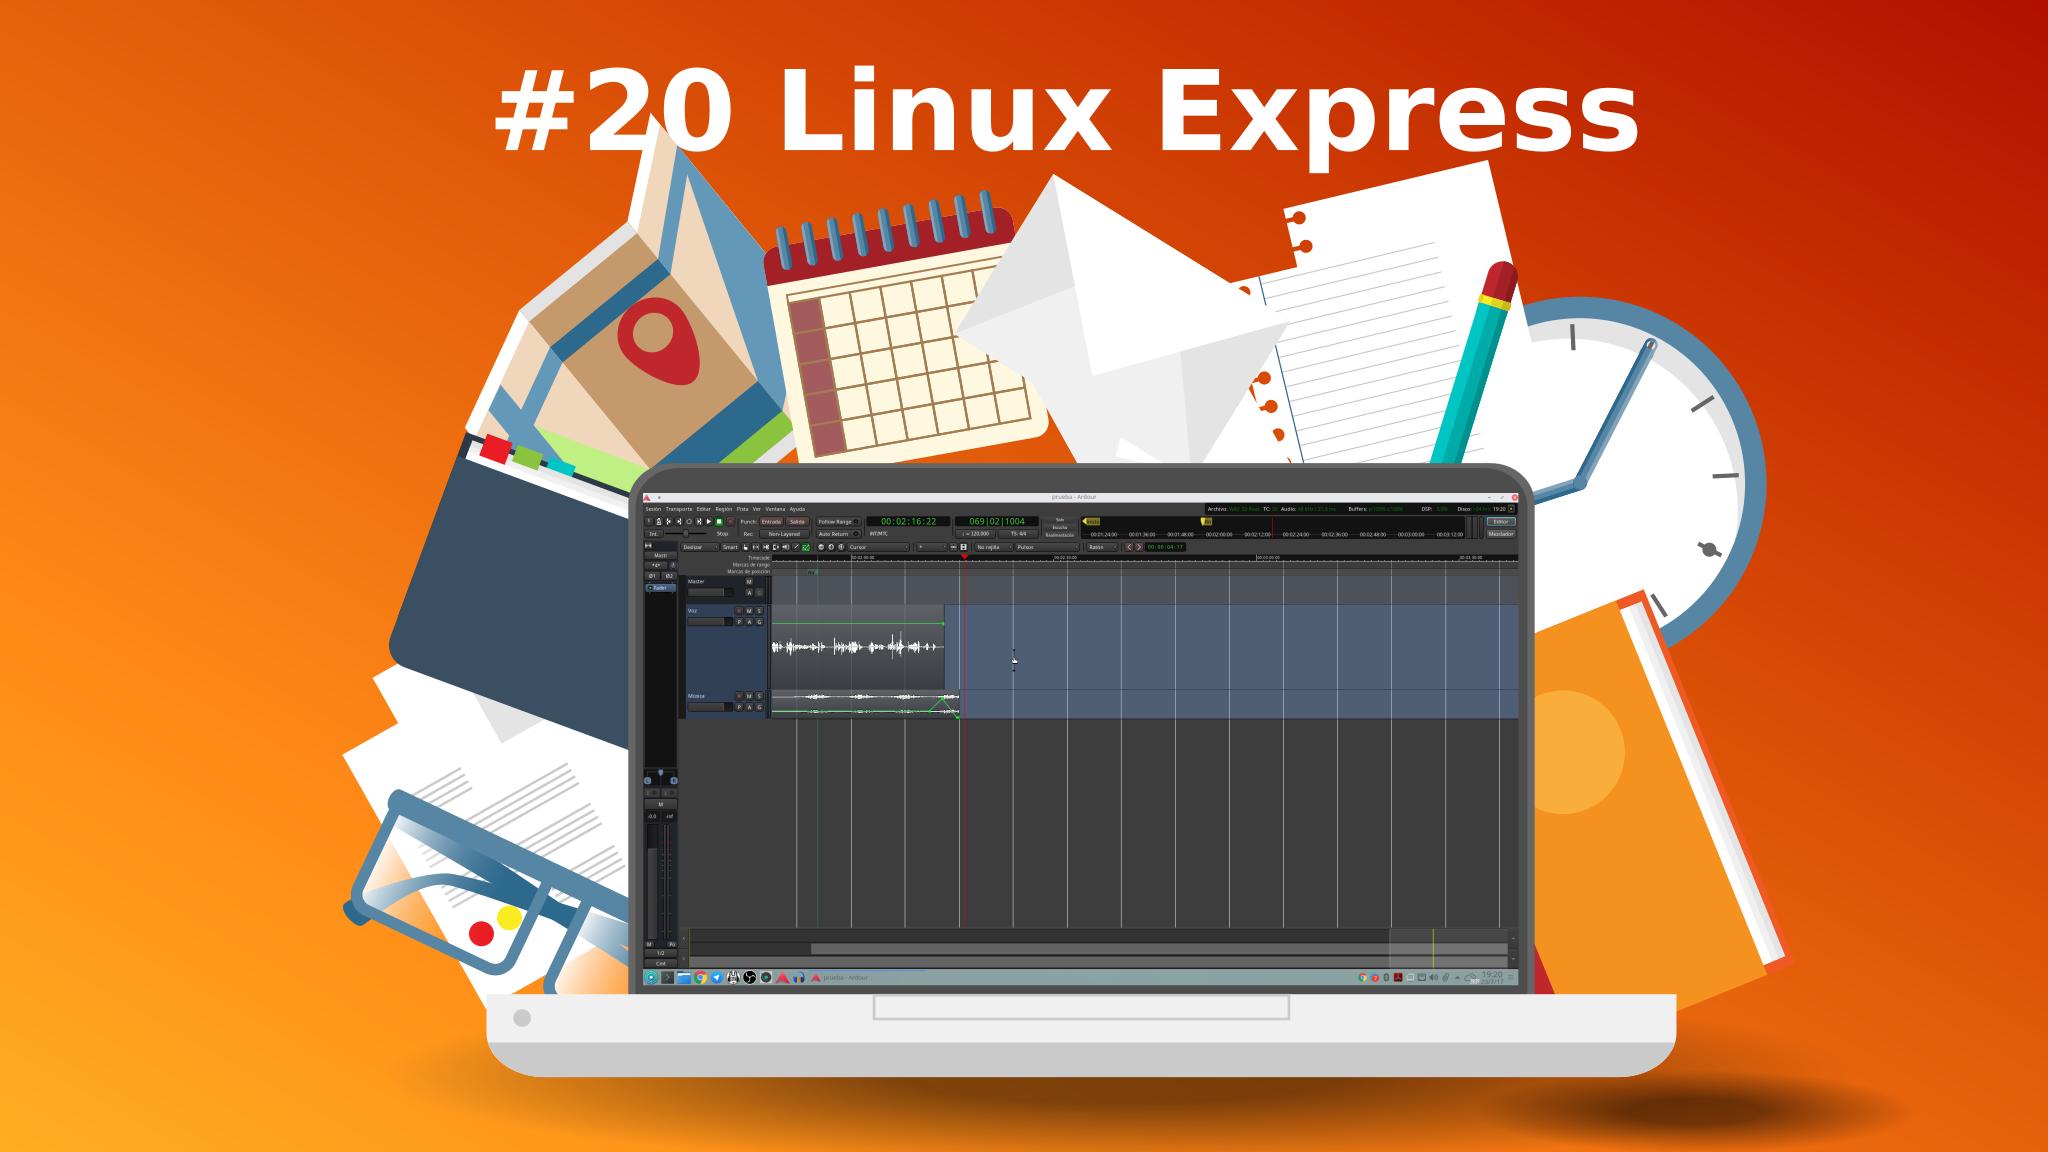 #20 Linux Express